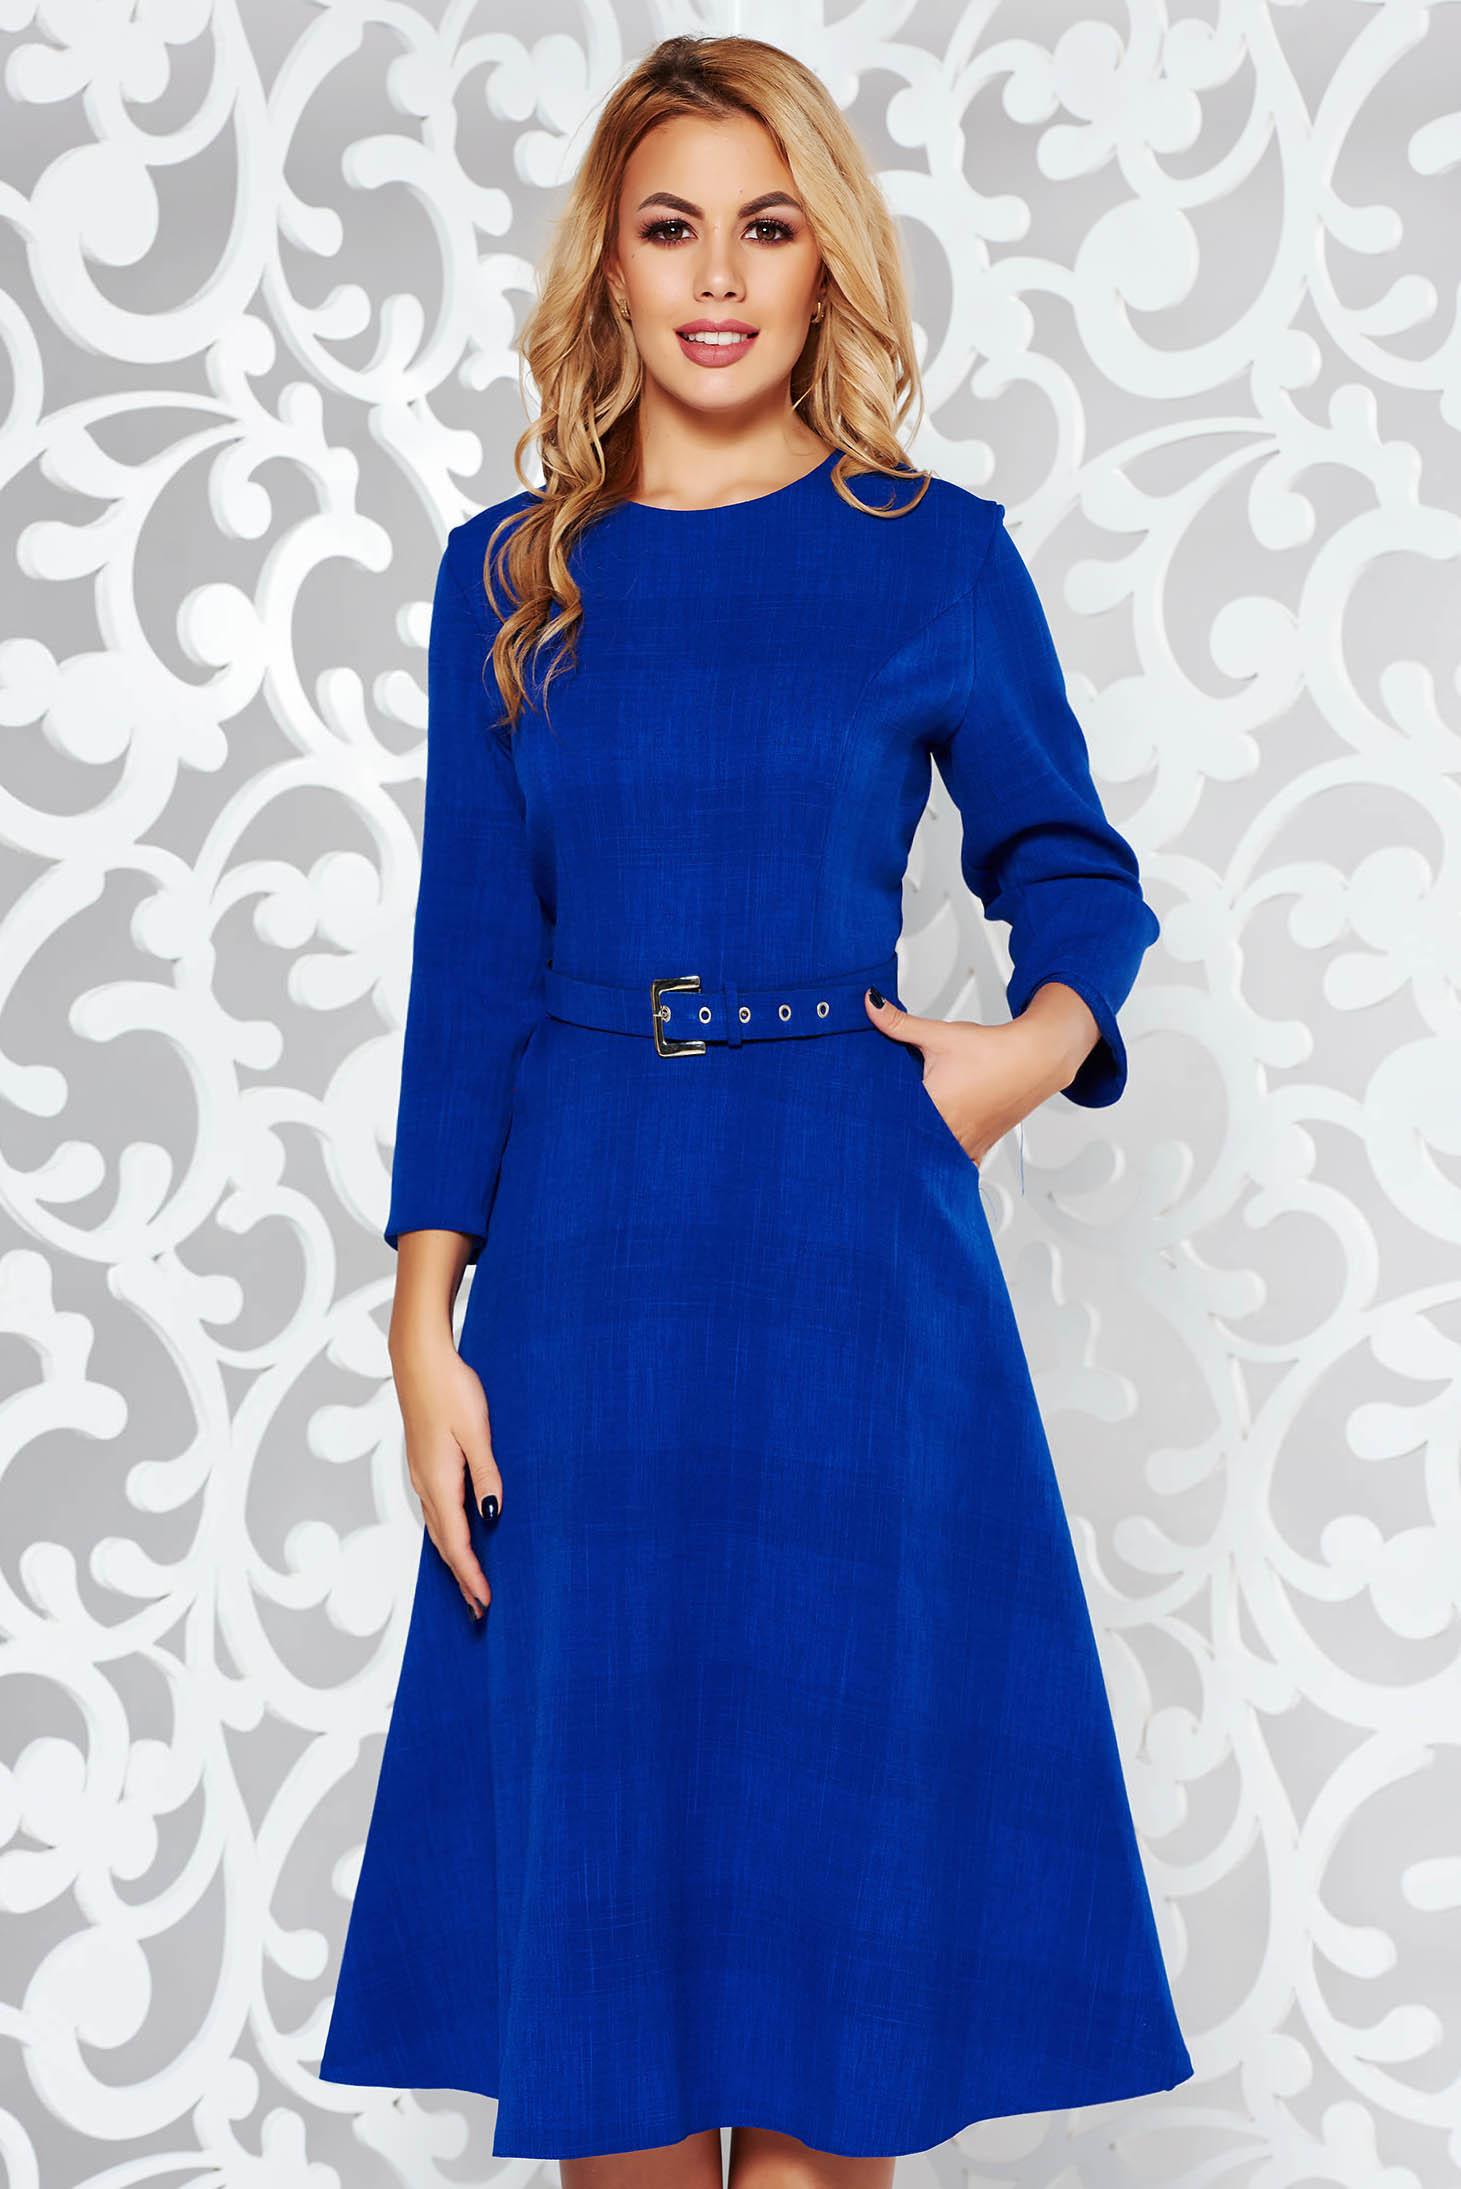 Blue elegant midi cloche dress slightly elastic fabric with pockets accessorized with belt